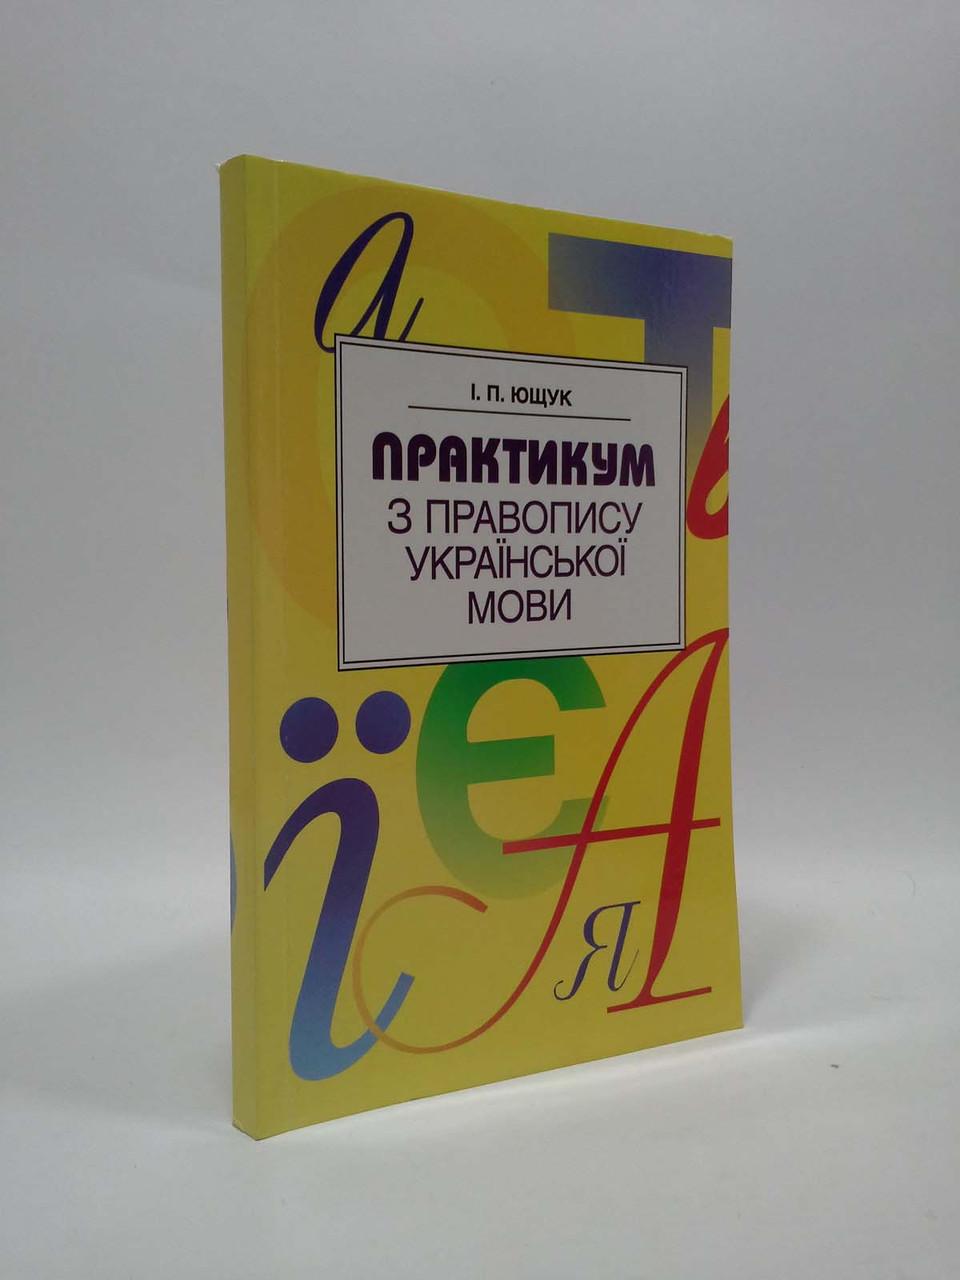 правопису укрансько онлайн решебник ющук практикум з мови